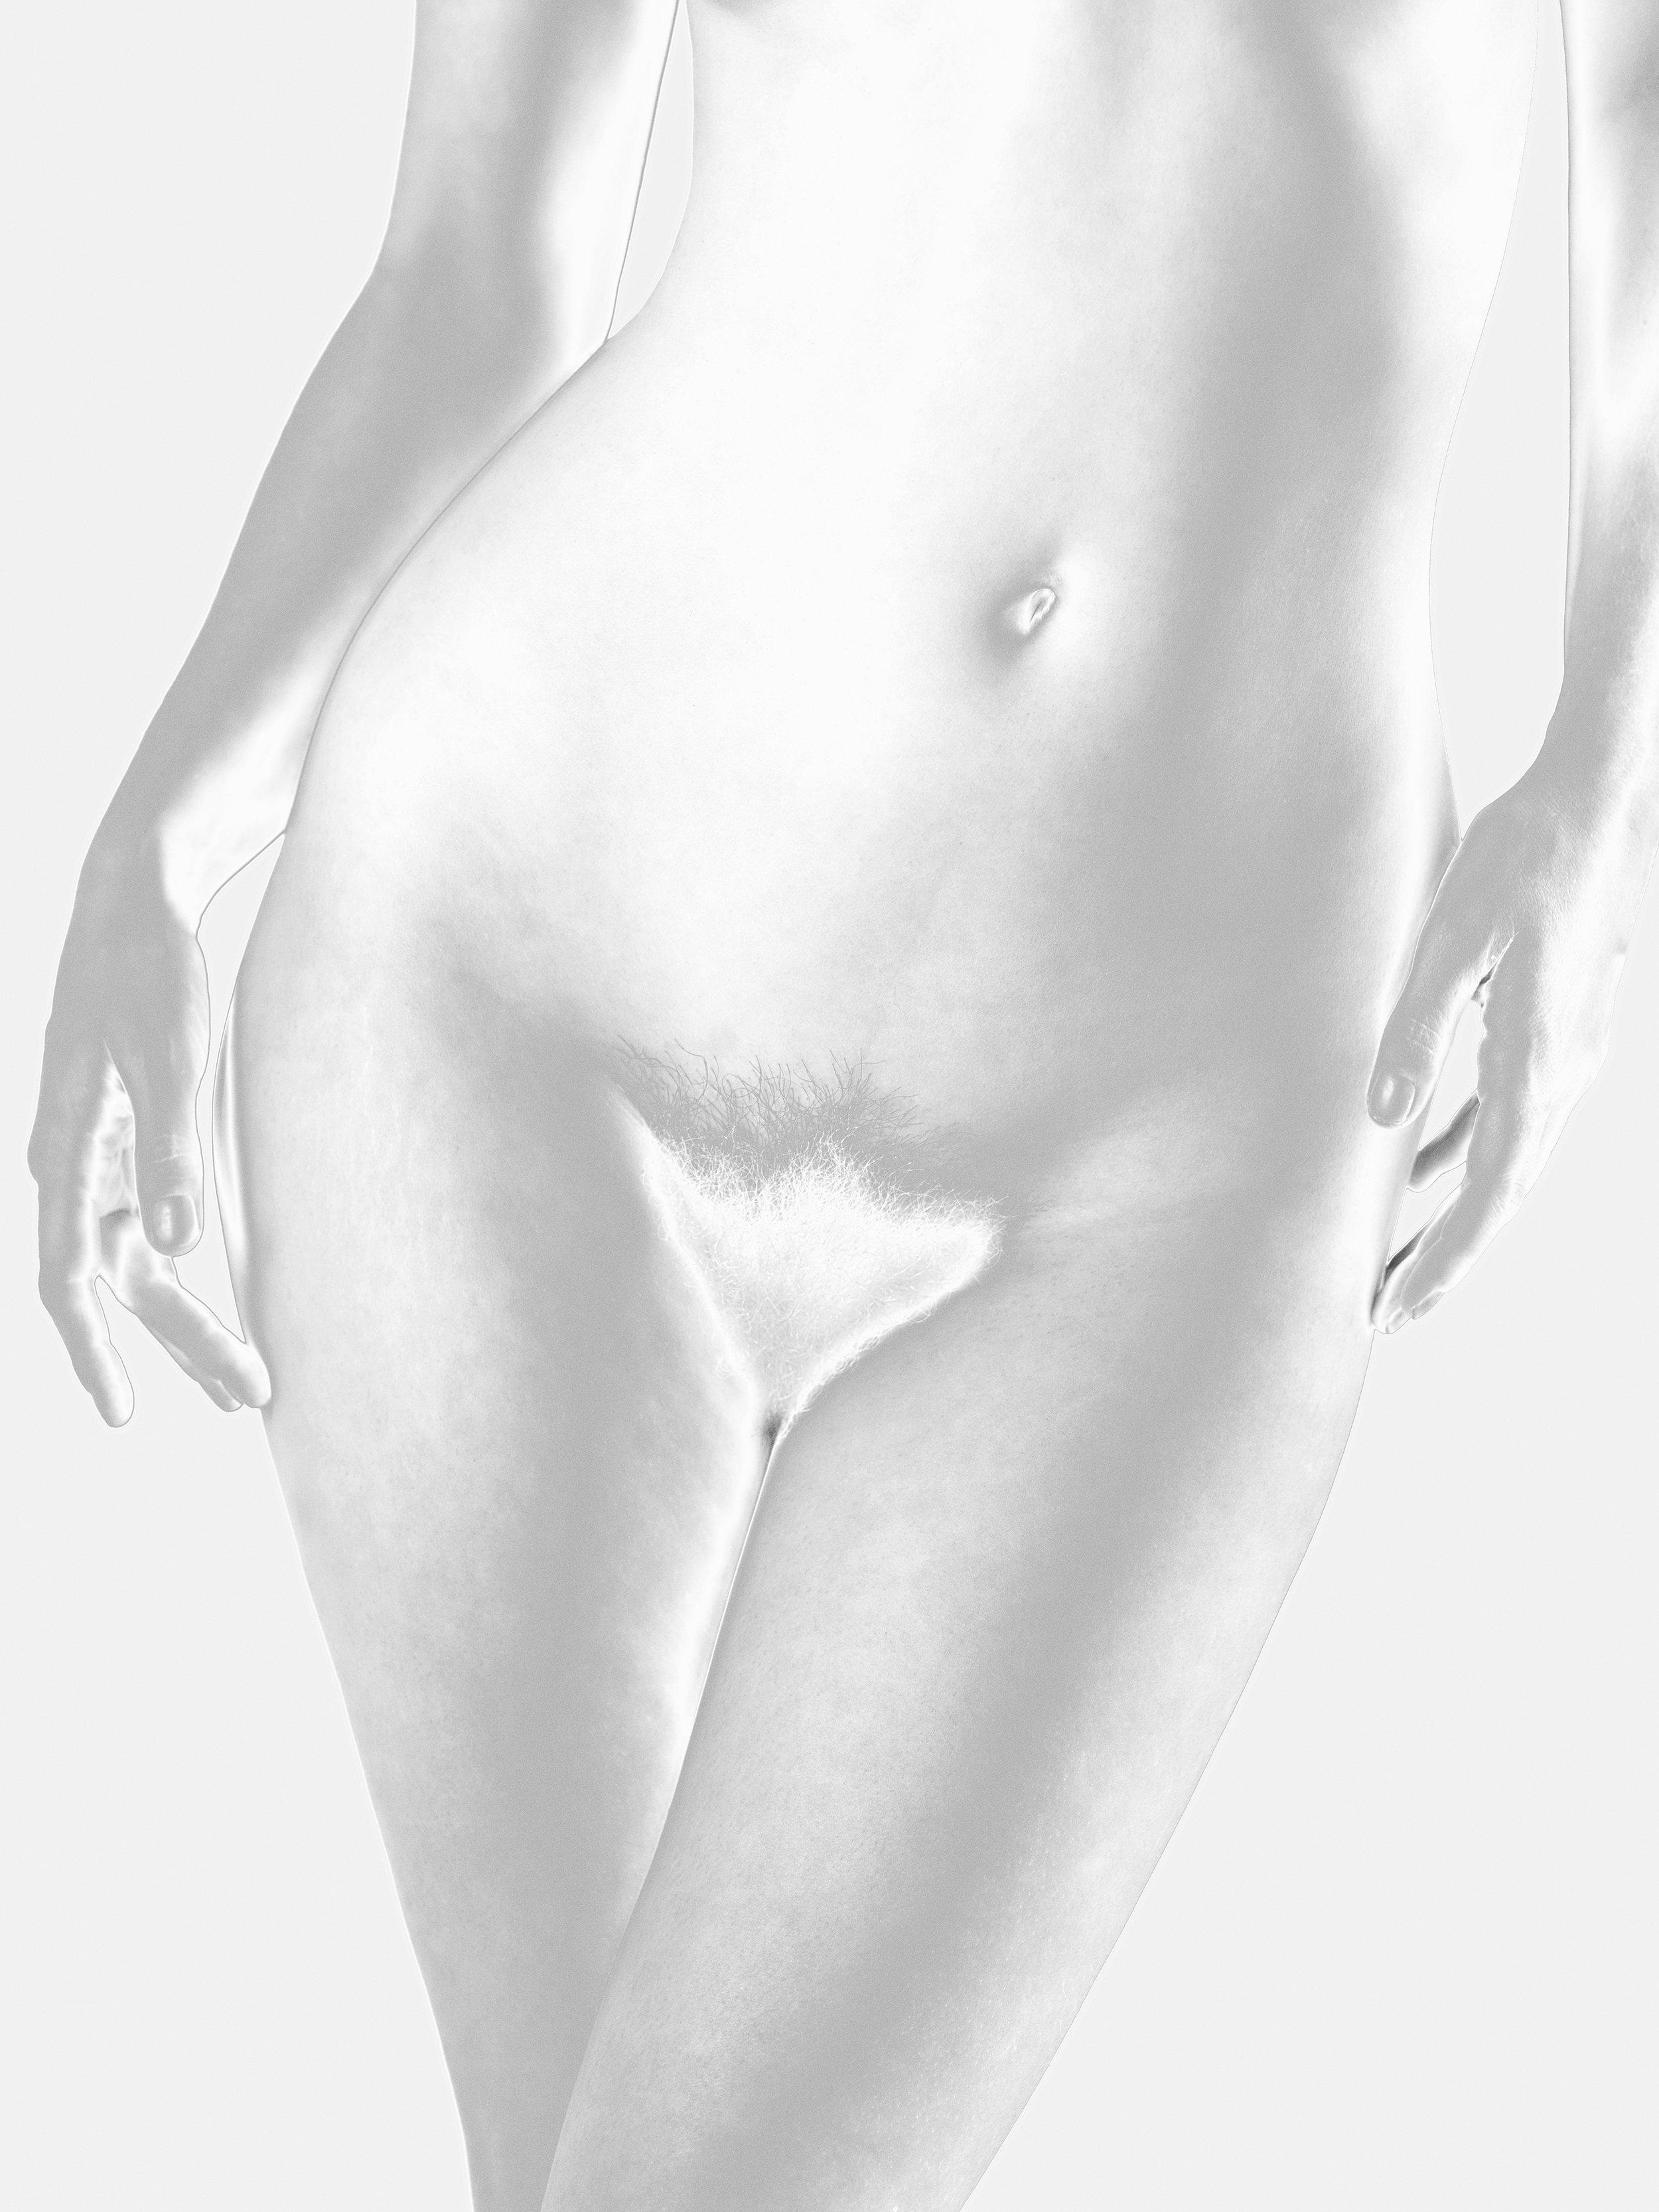 MONA KUHN Bushes 01, 2018 Chromogenic metallic archival print  Available sizes: 20 x 15 inches, edition of 8 + 2AP 40 x 30 inches, edition of 8 + 2AP